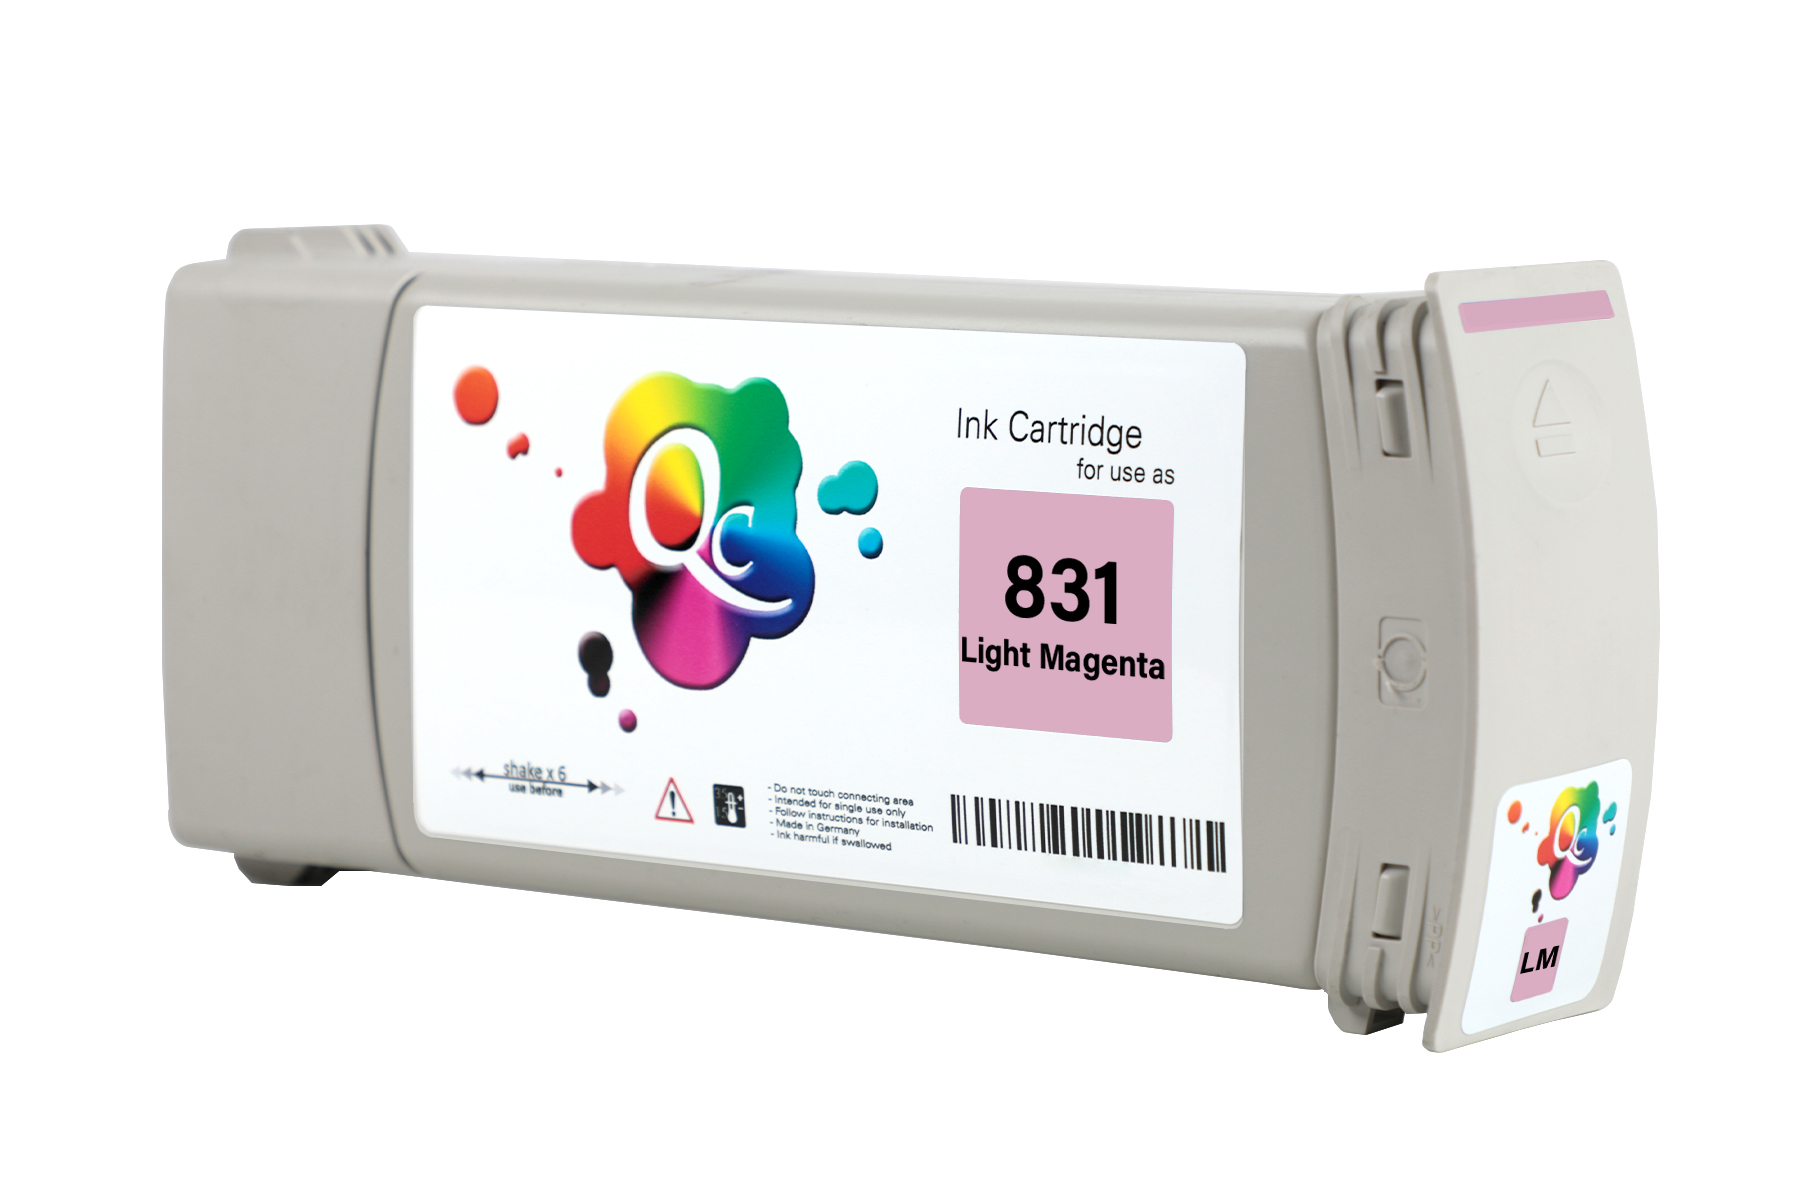 HP 831 CZ699A Light Magenta Açık Kırmızı Lateks Muadil Kartuş 775ml